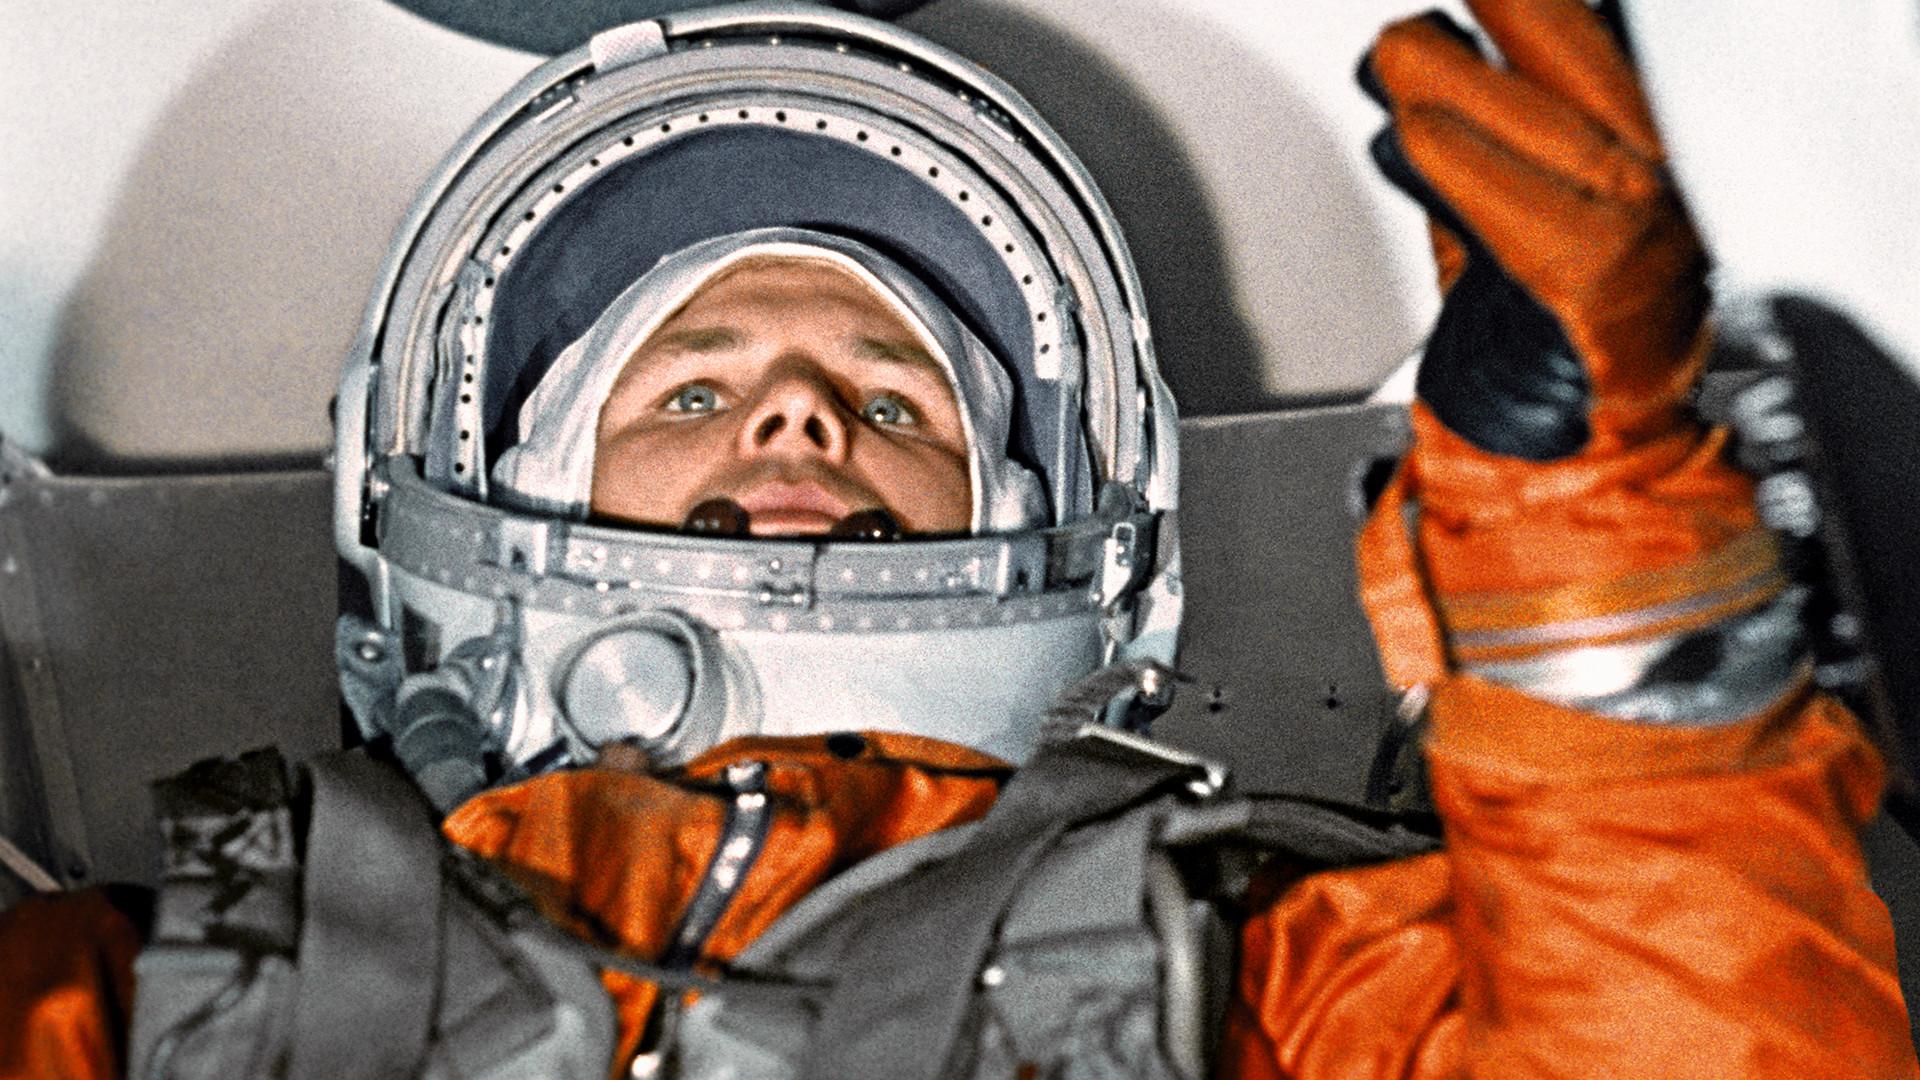 Iouri Gagarine avant le lancement du vaisseau Vostok-1.